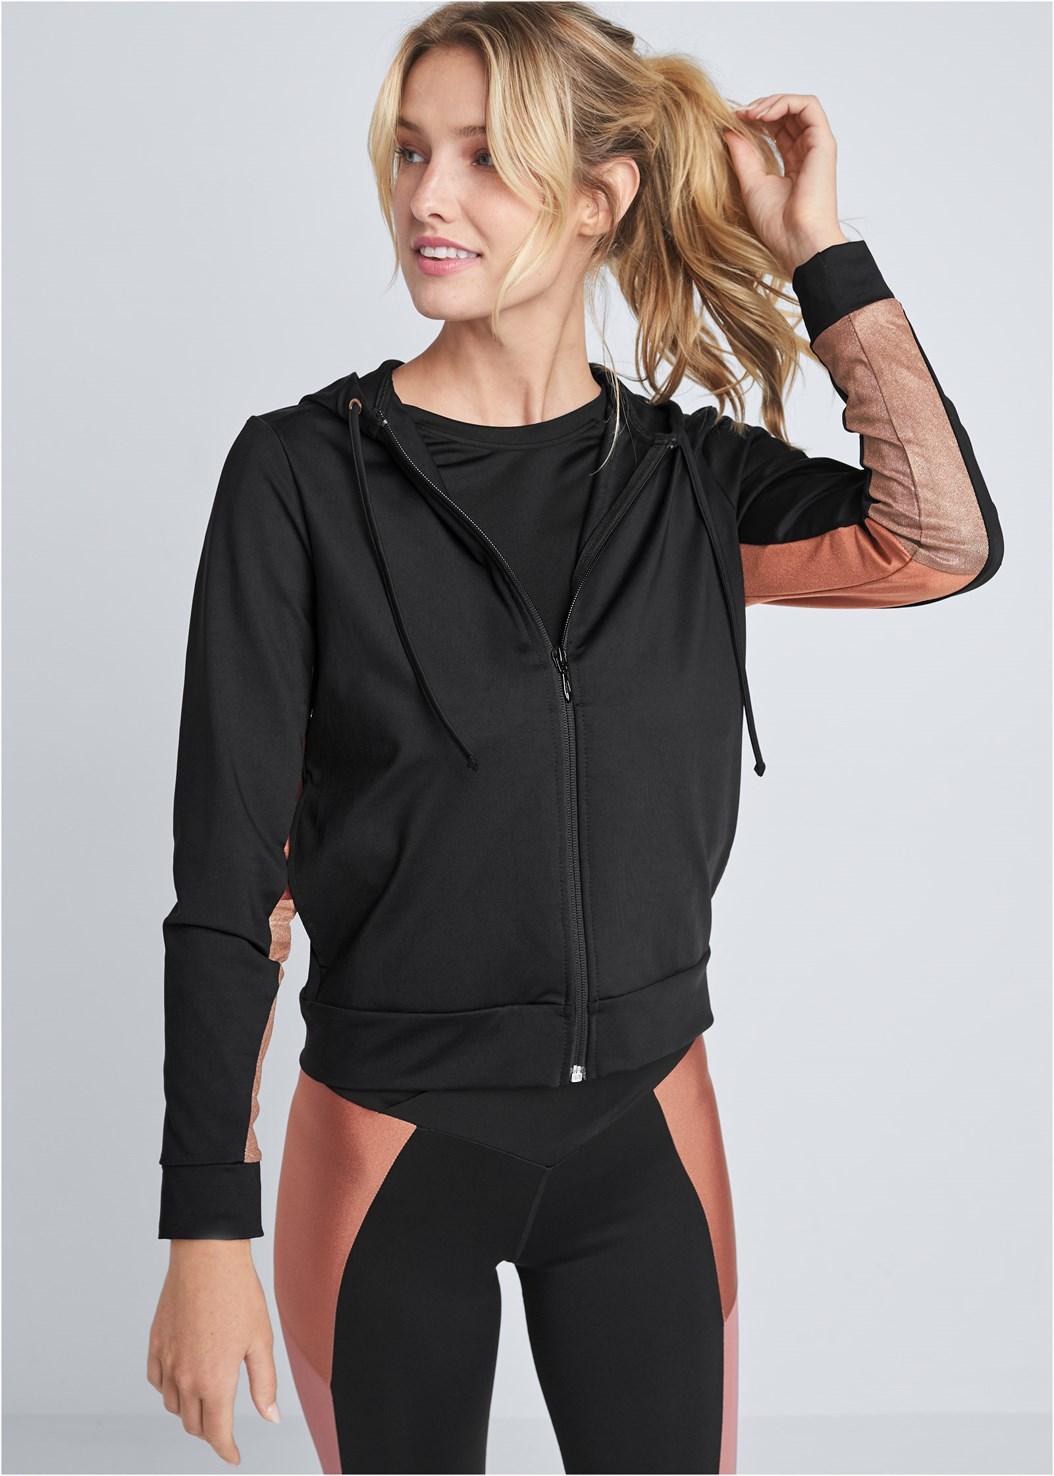 Color Block Shine Jacket,Color Block Shine Set,Wirefree Comfort Bra